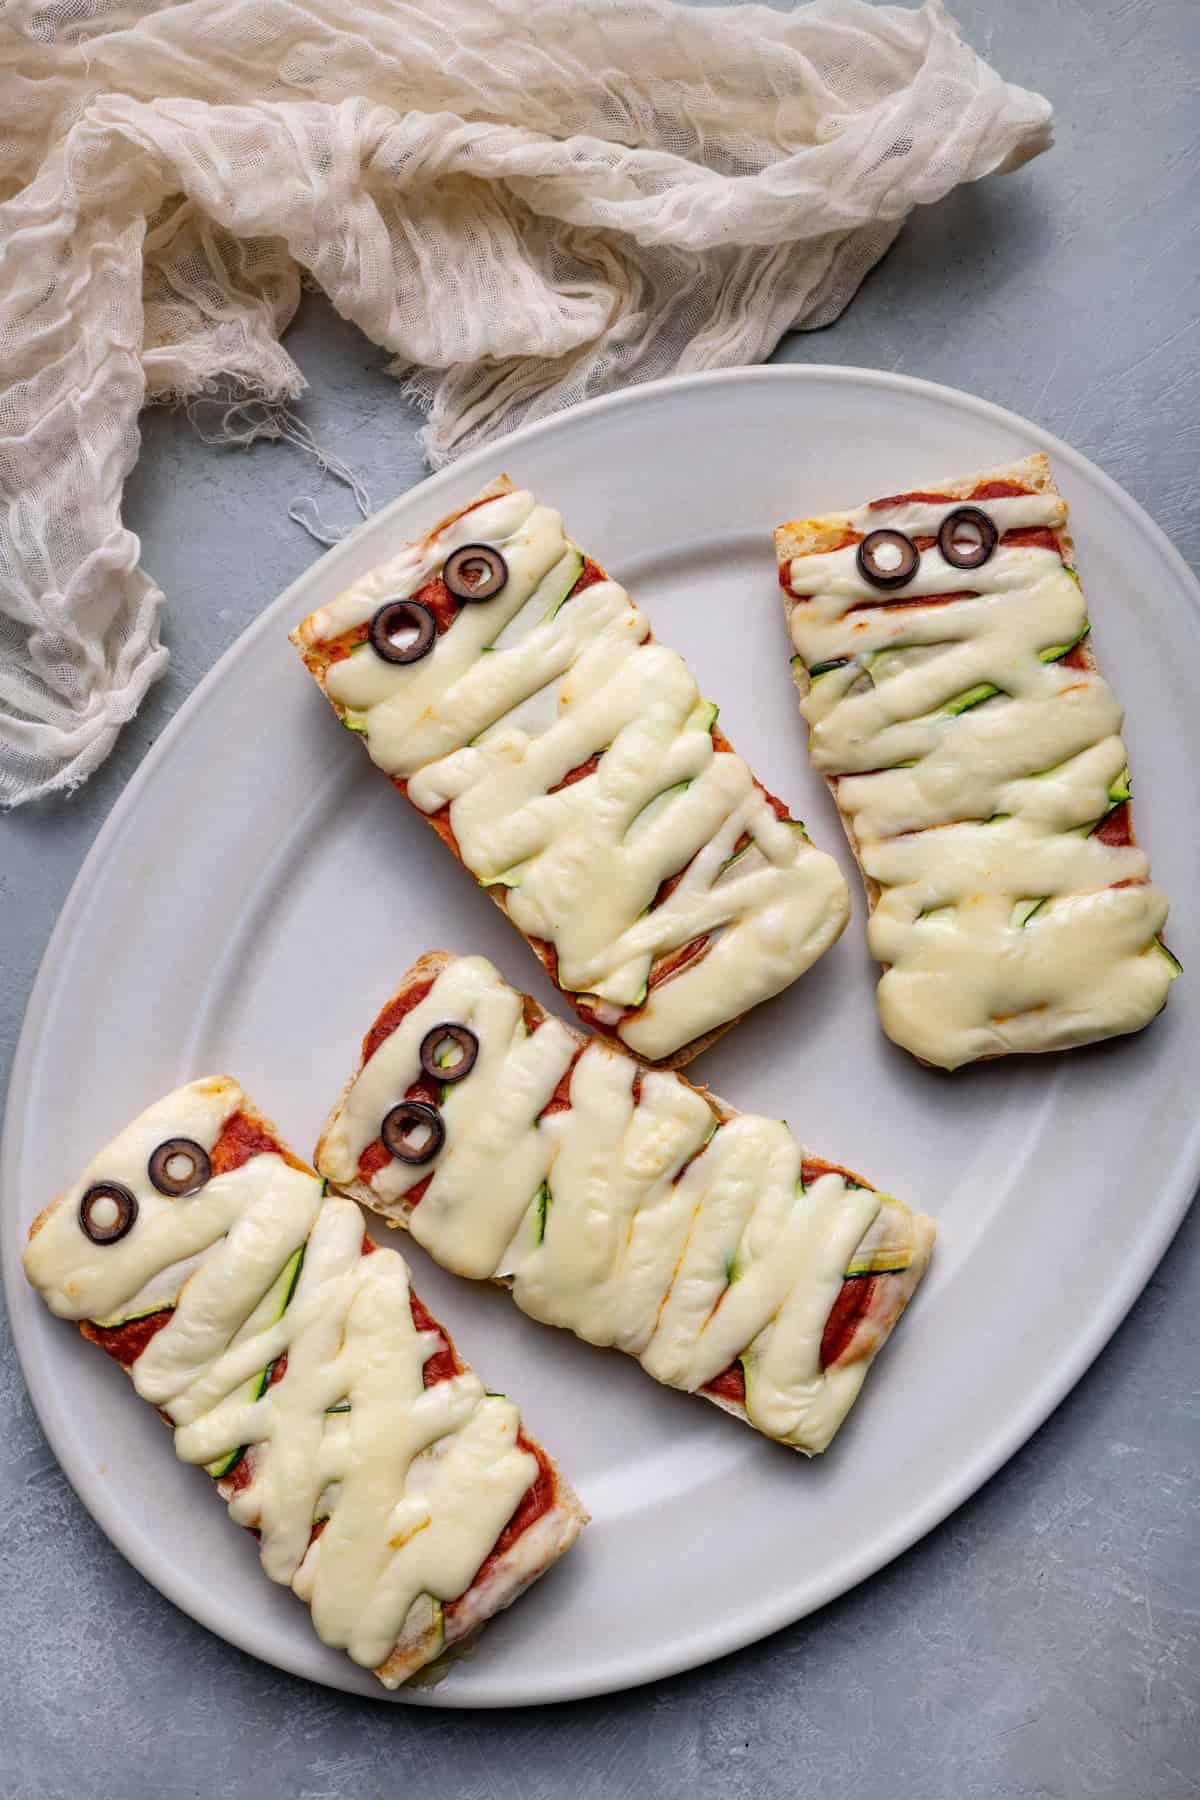 Mummy pizzas on a platter